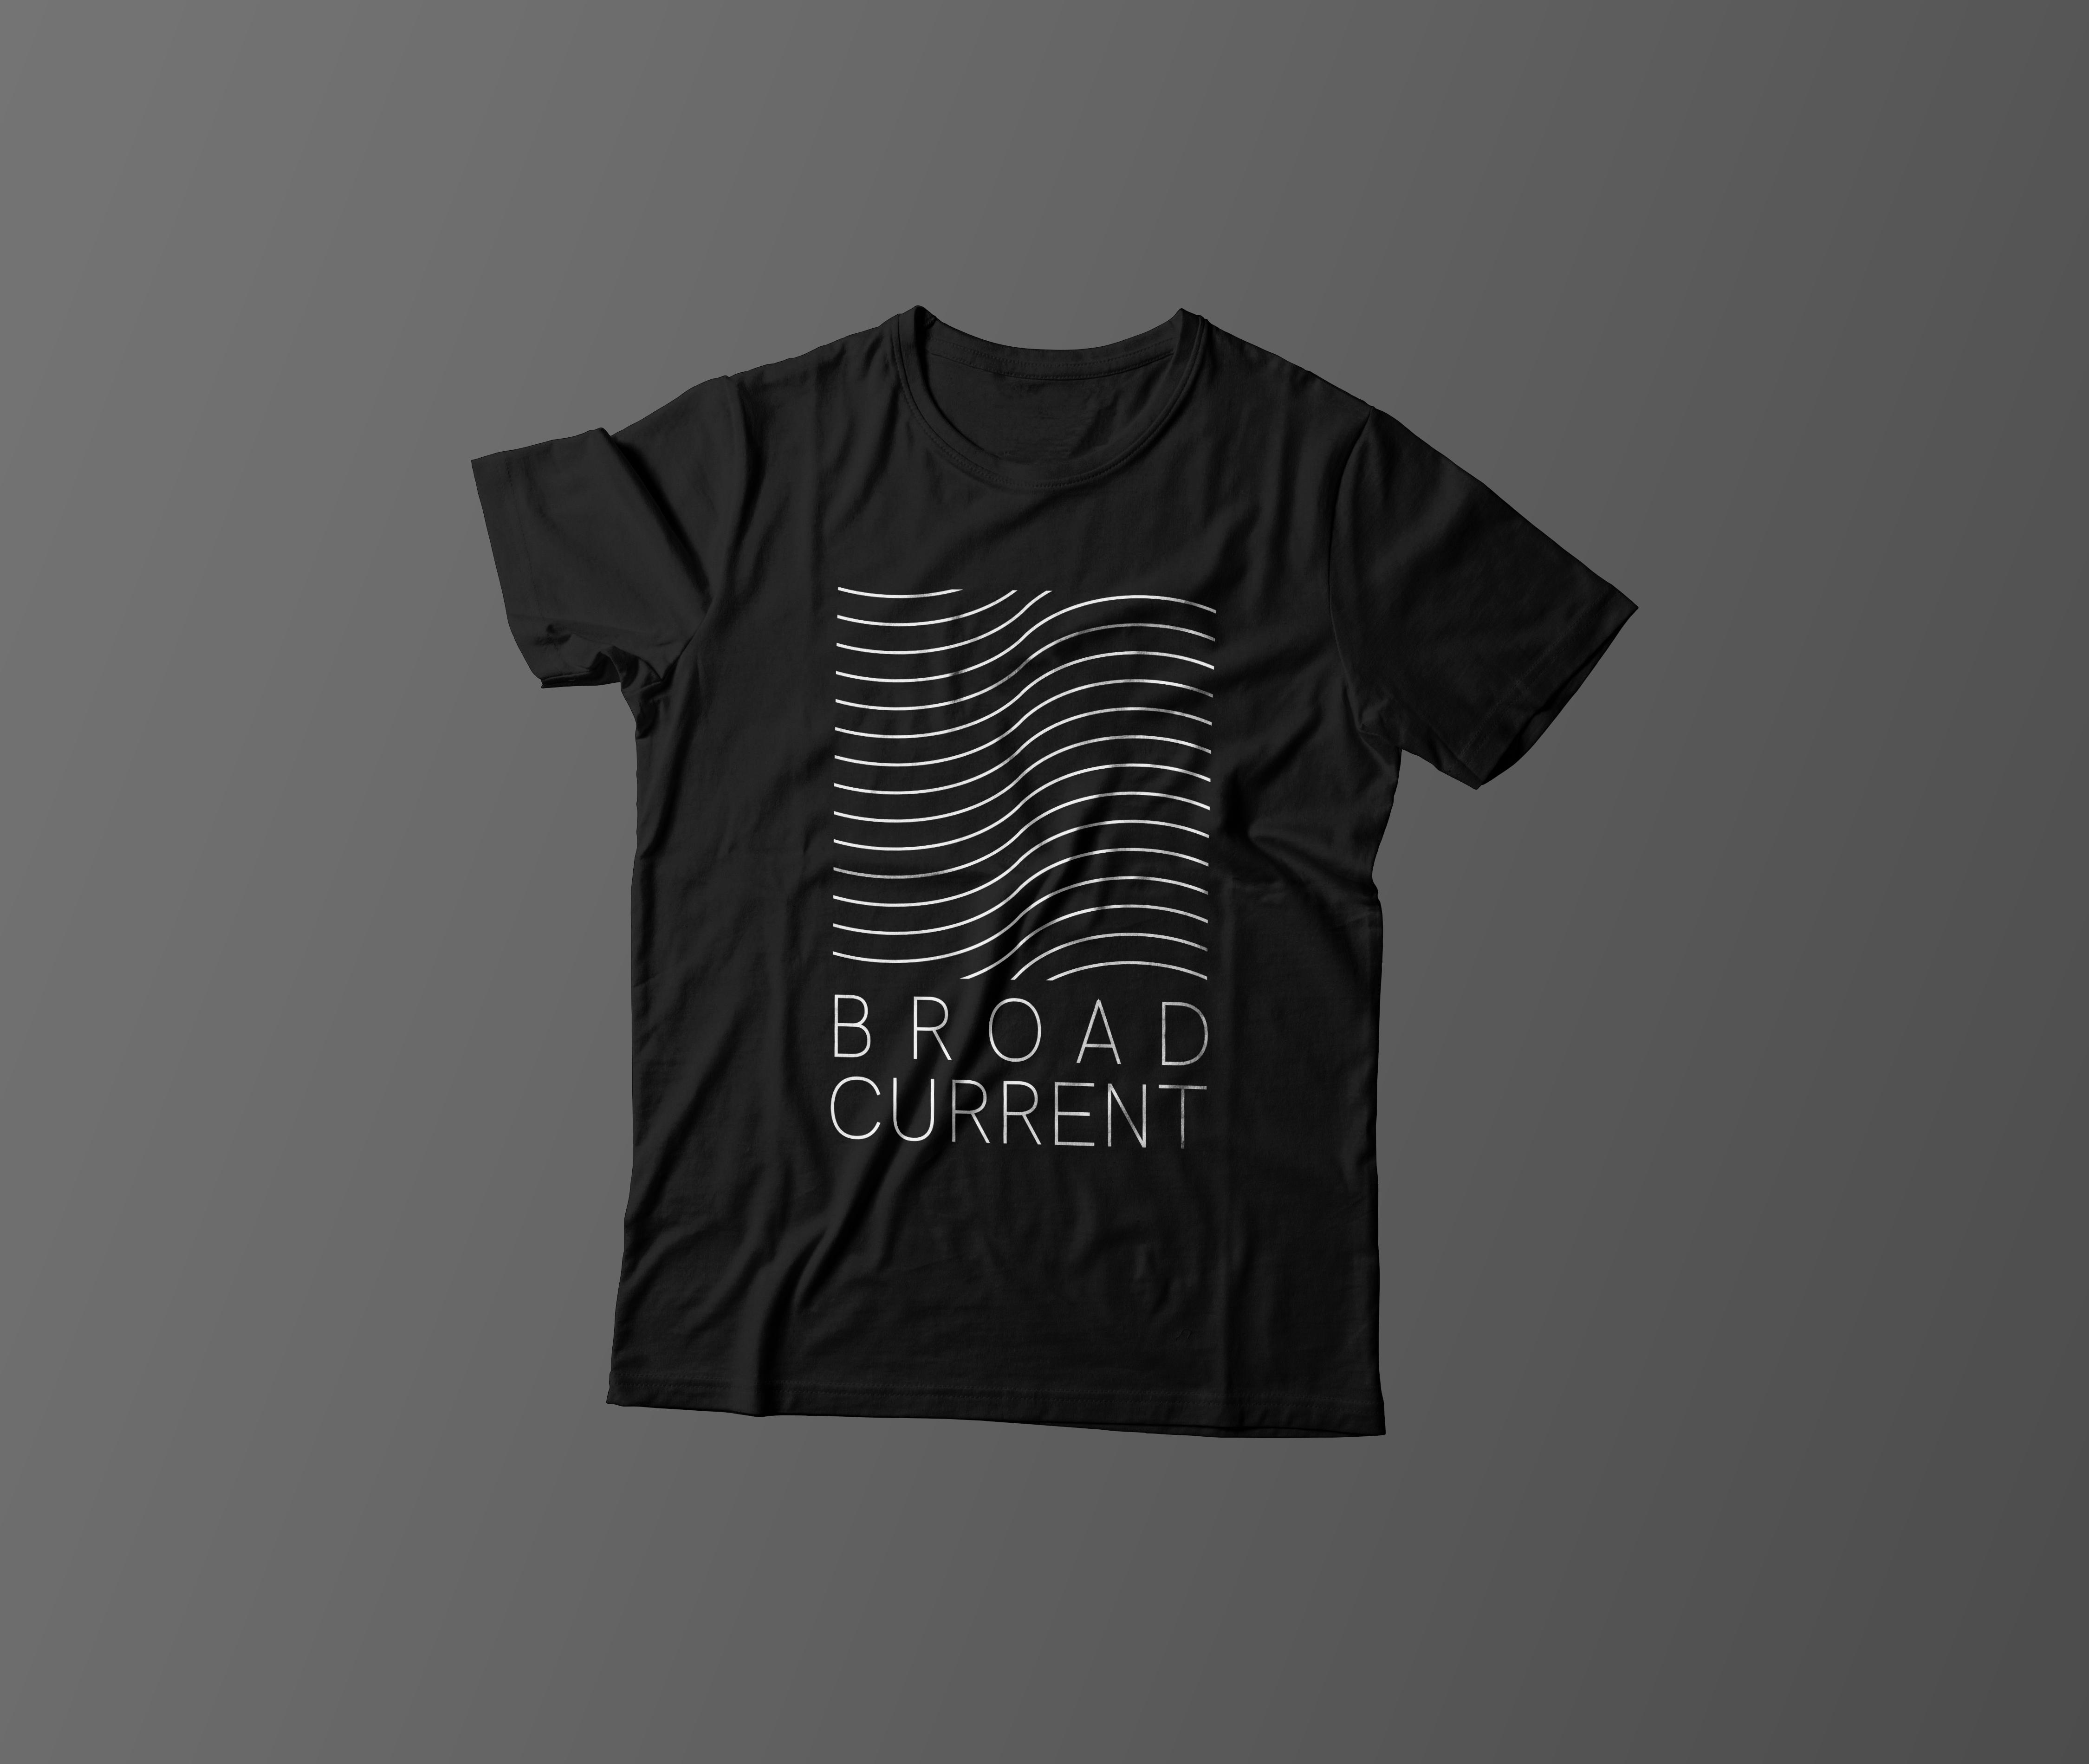 Broad Current T-shirt